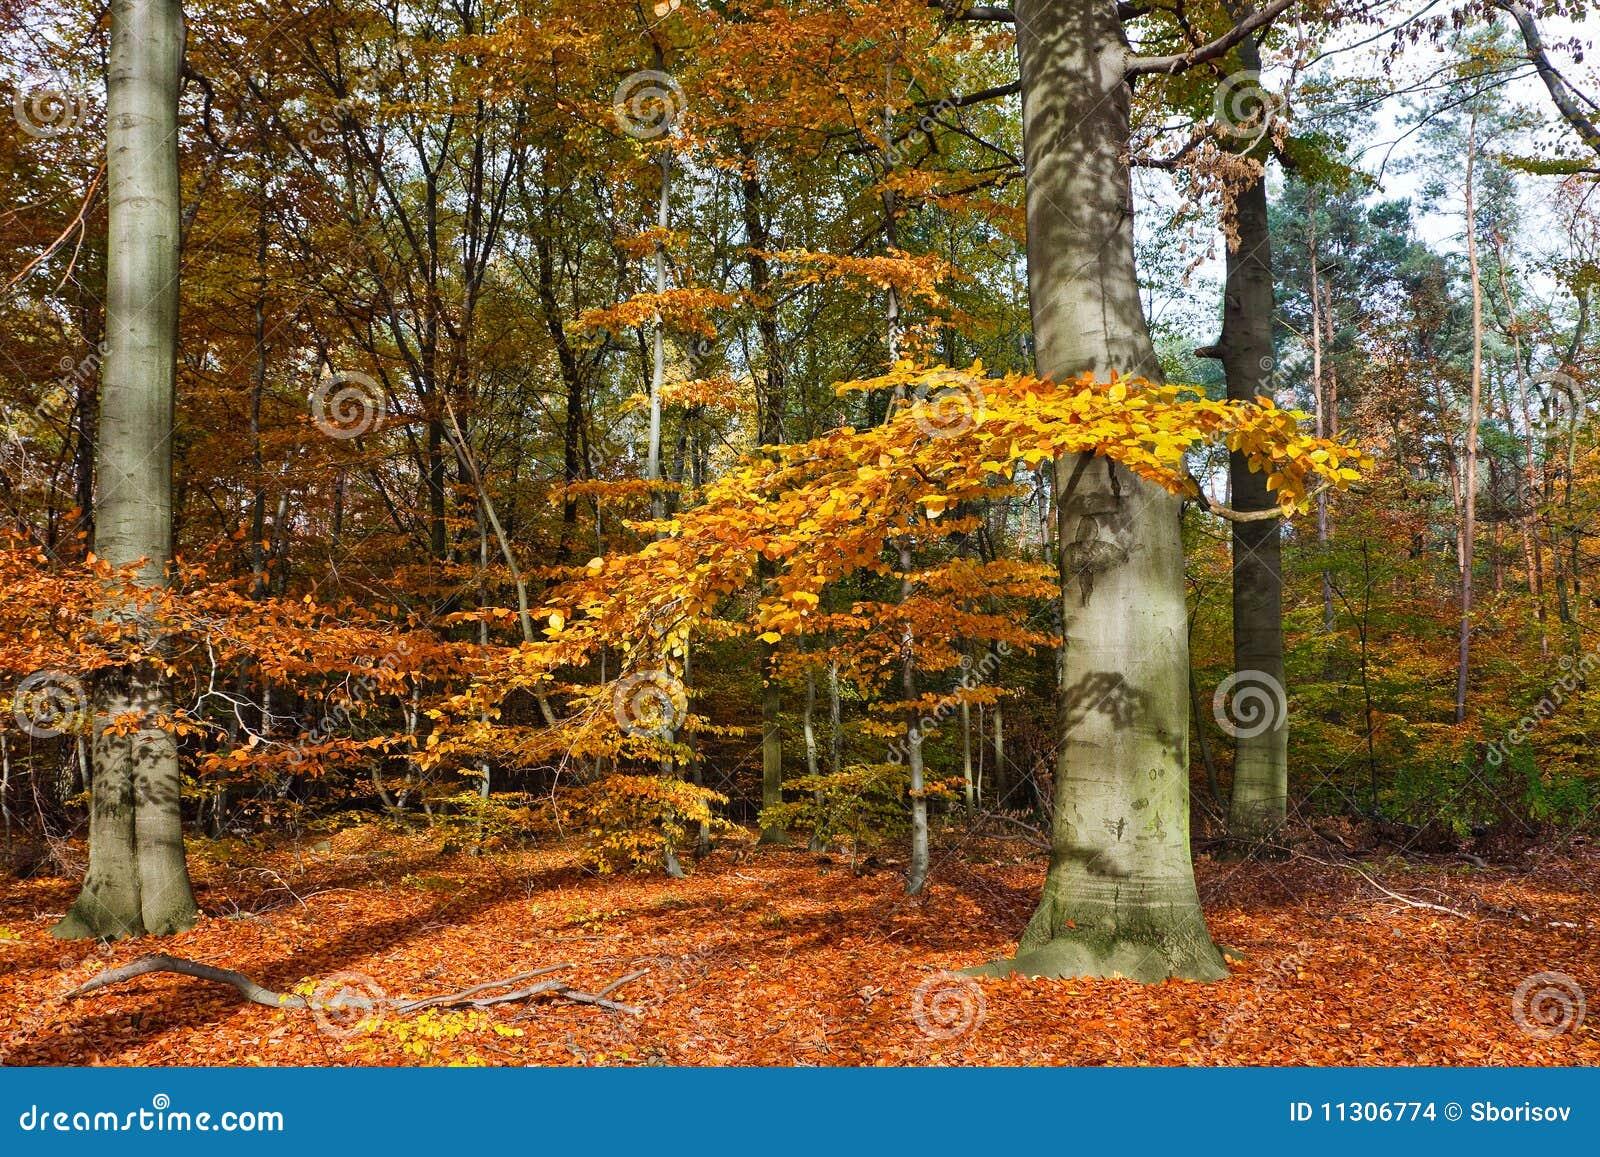 Vibrierendes Bild des Herbstwaldes